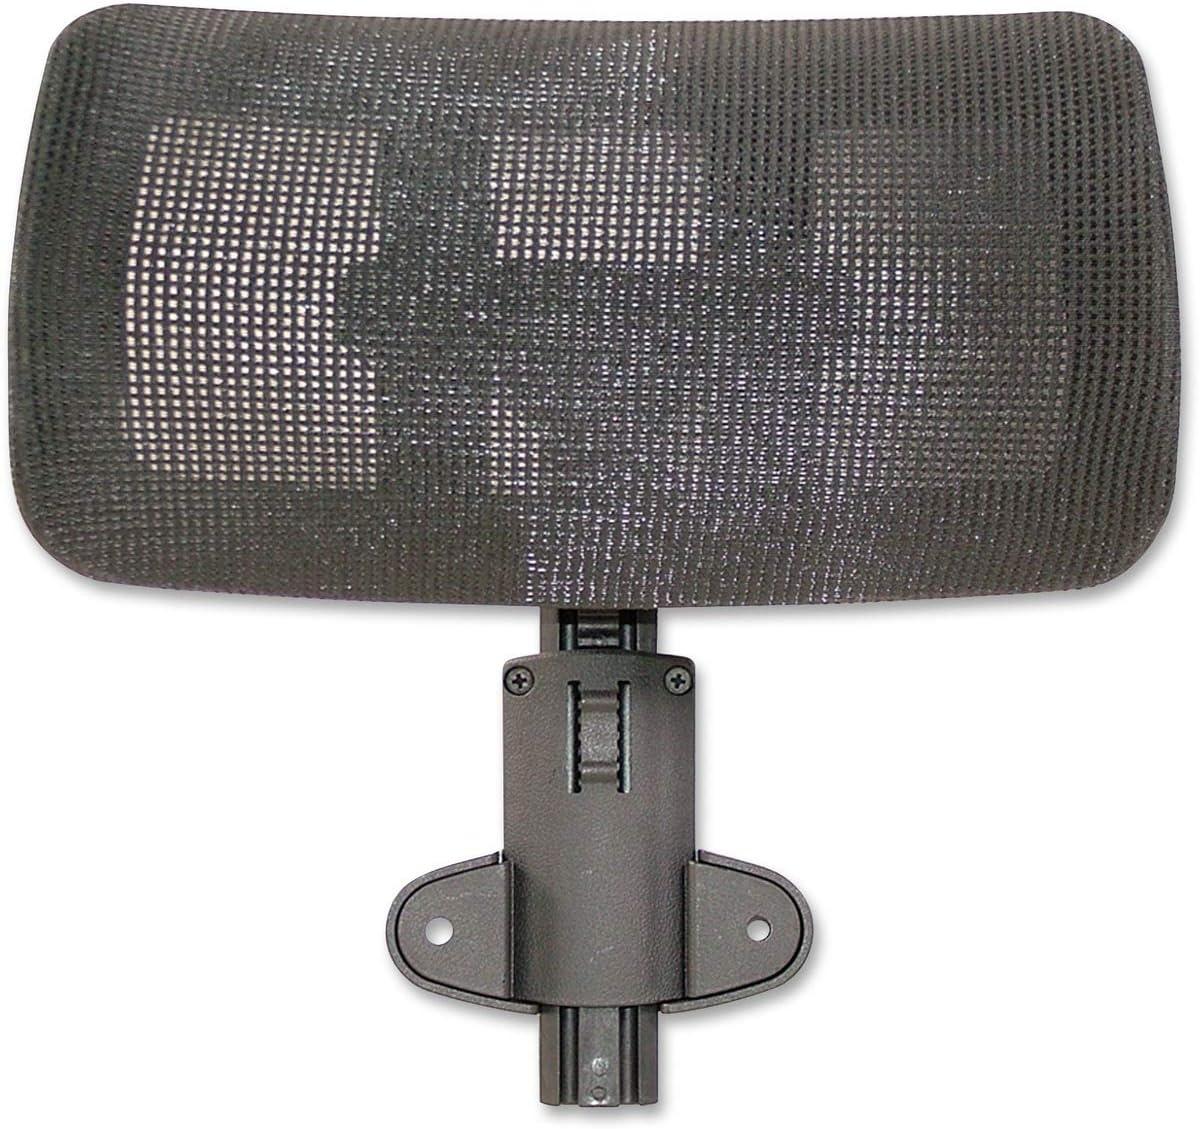 Lorell Hi-Back Chair Mesh Headrest, Black – LLR85562 3